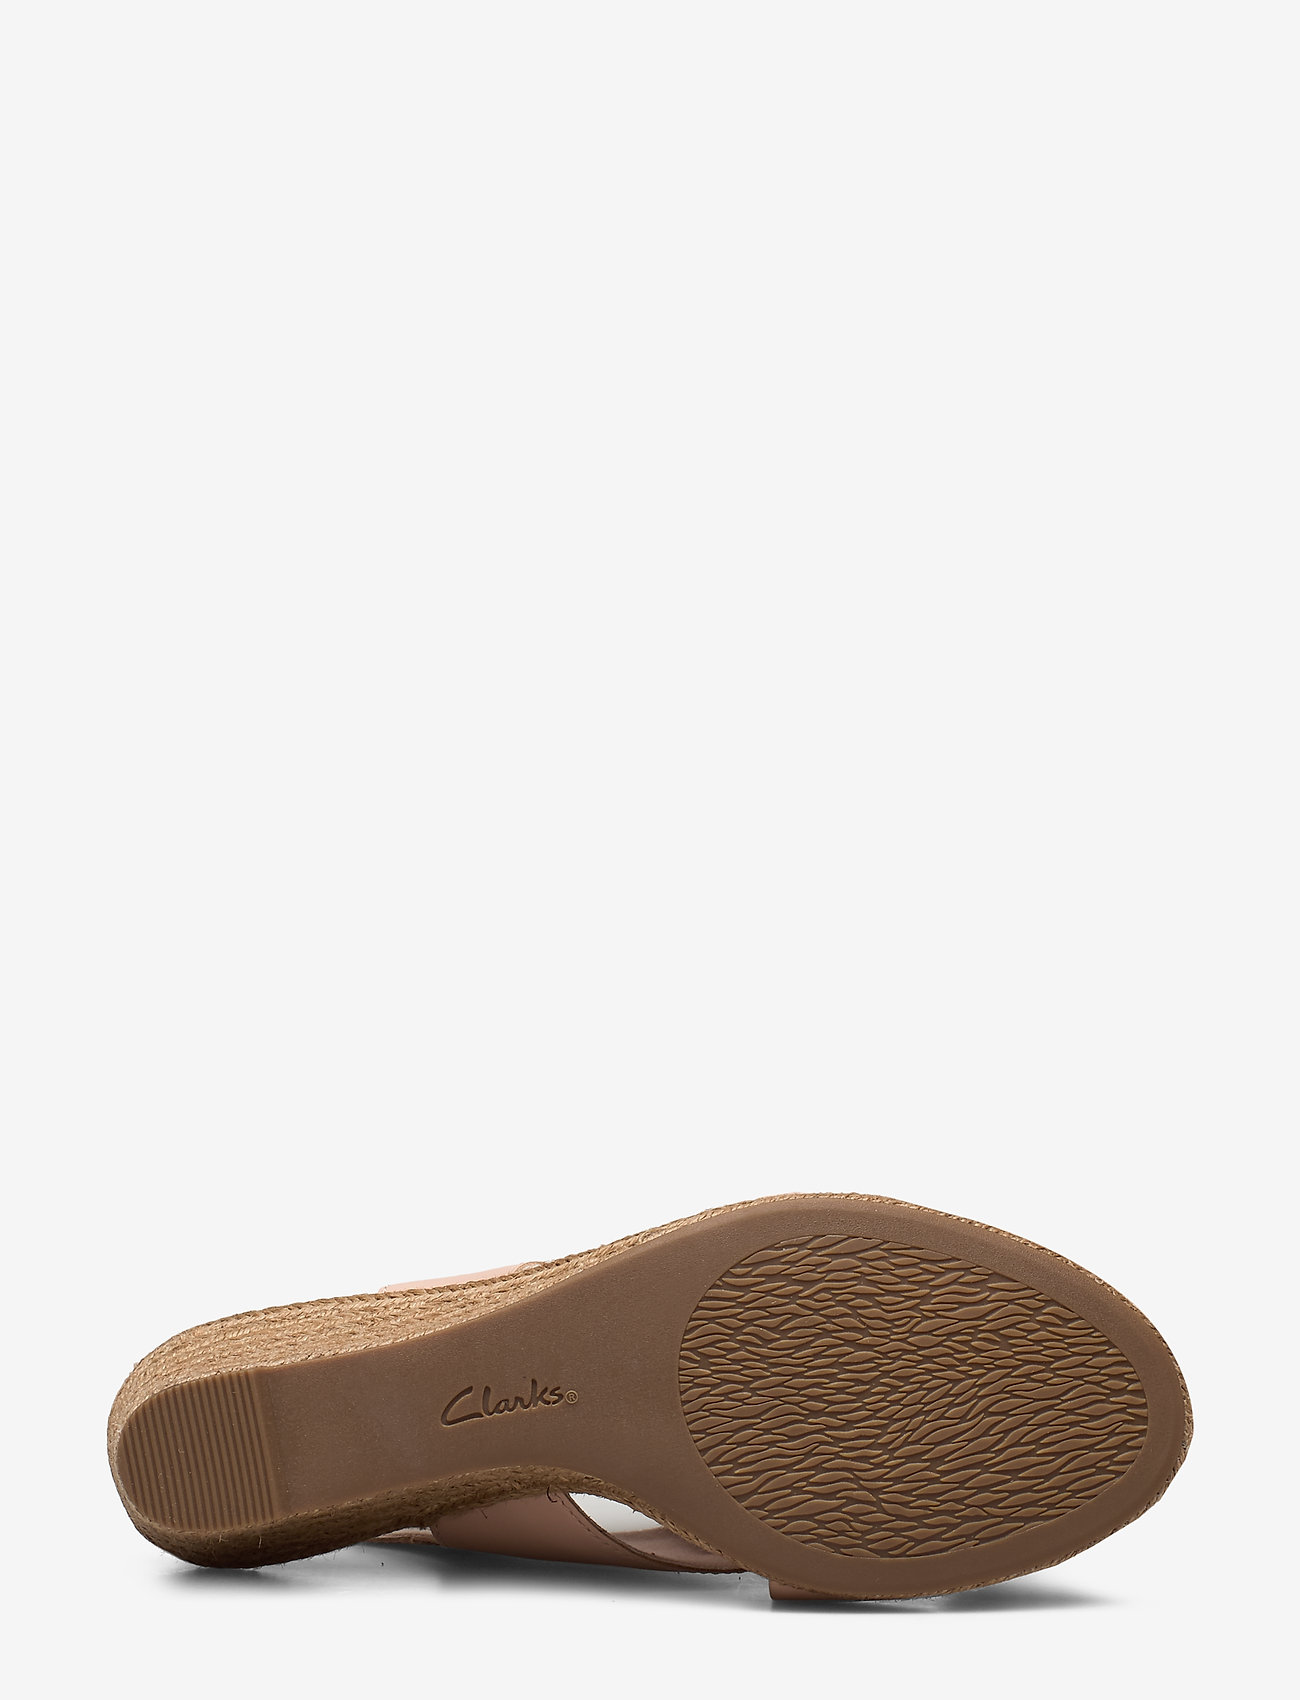 Lafley Alaine (Blush Leather) - Clarks